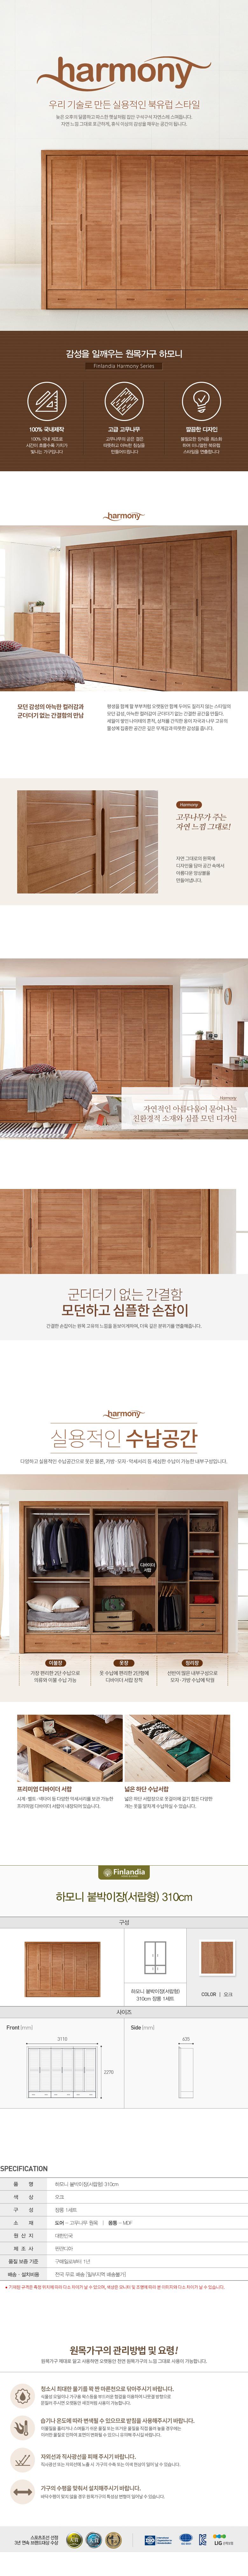 harmony_closet310.jpg